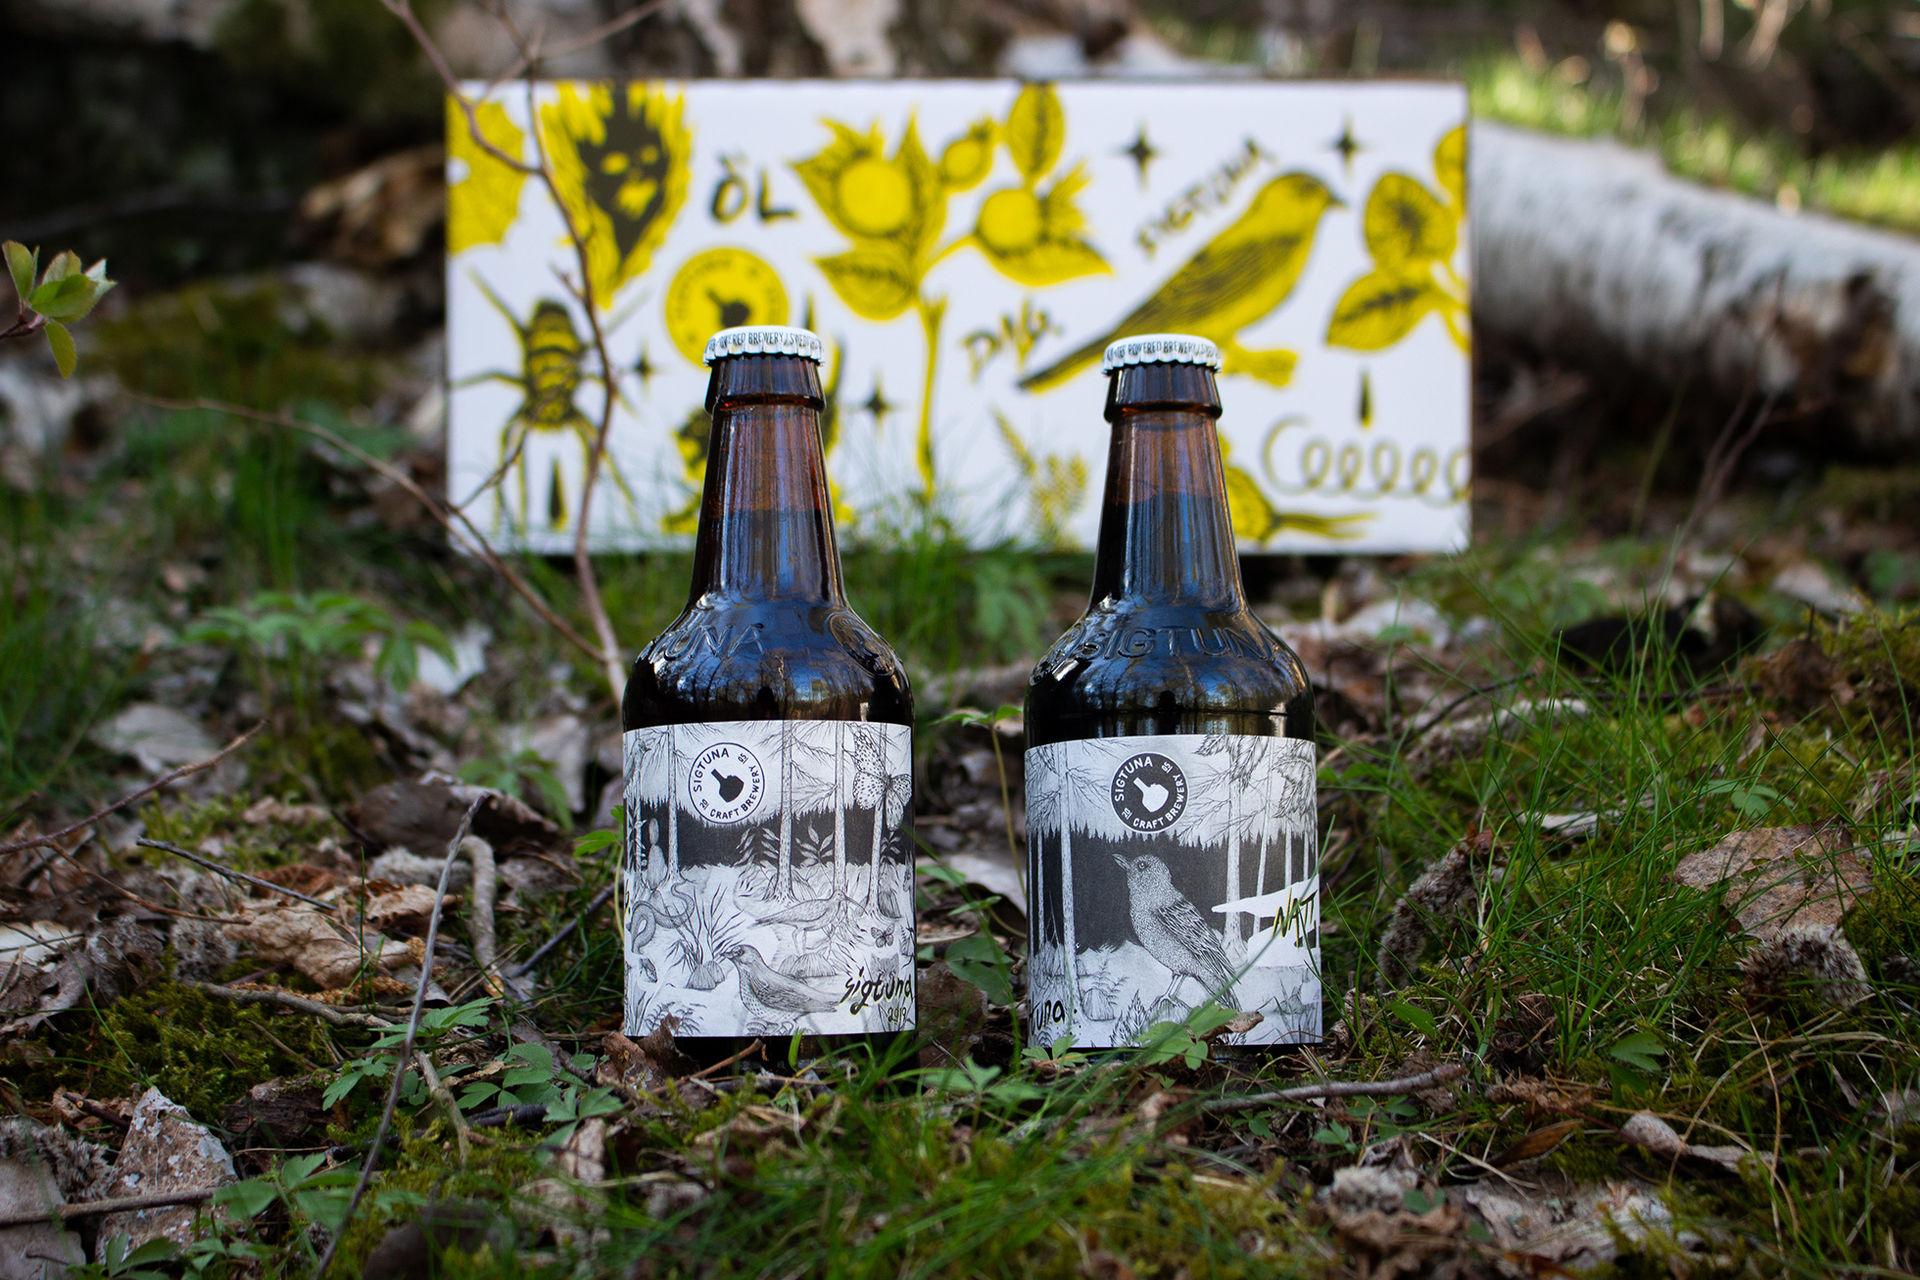 Nya öl från Sigtuna Brygghus